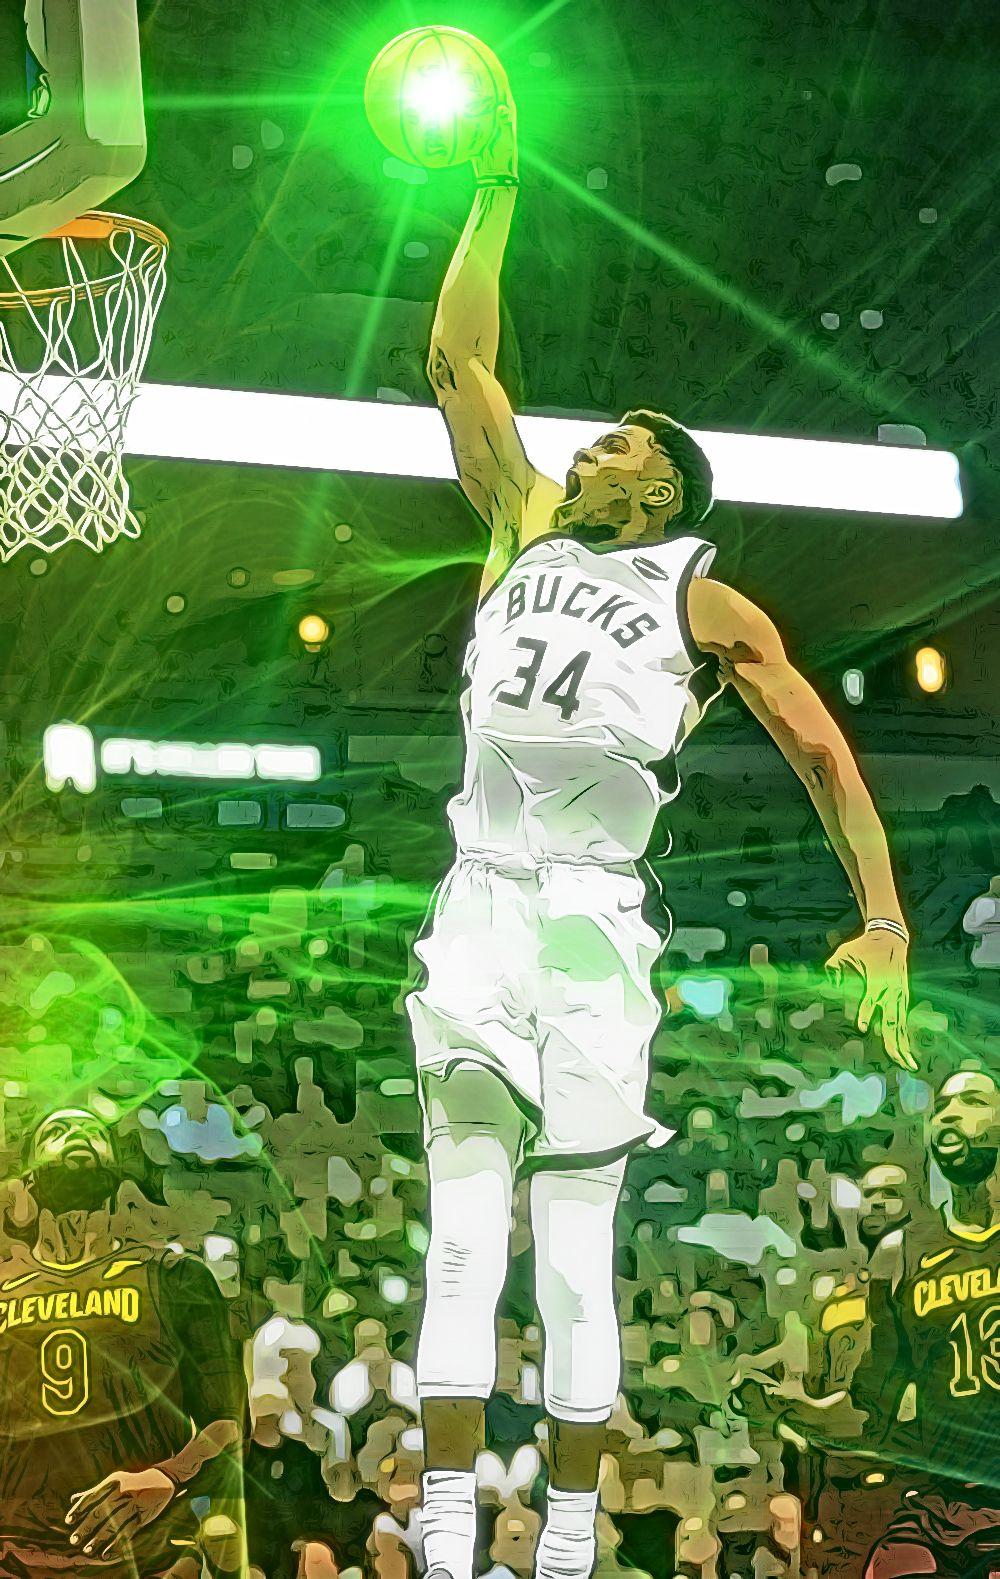 Giannis Antetokounmpo Dunk Nba Basketball Art Basketball Art Mvp Basketball